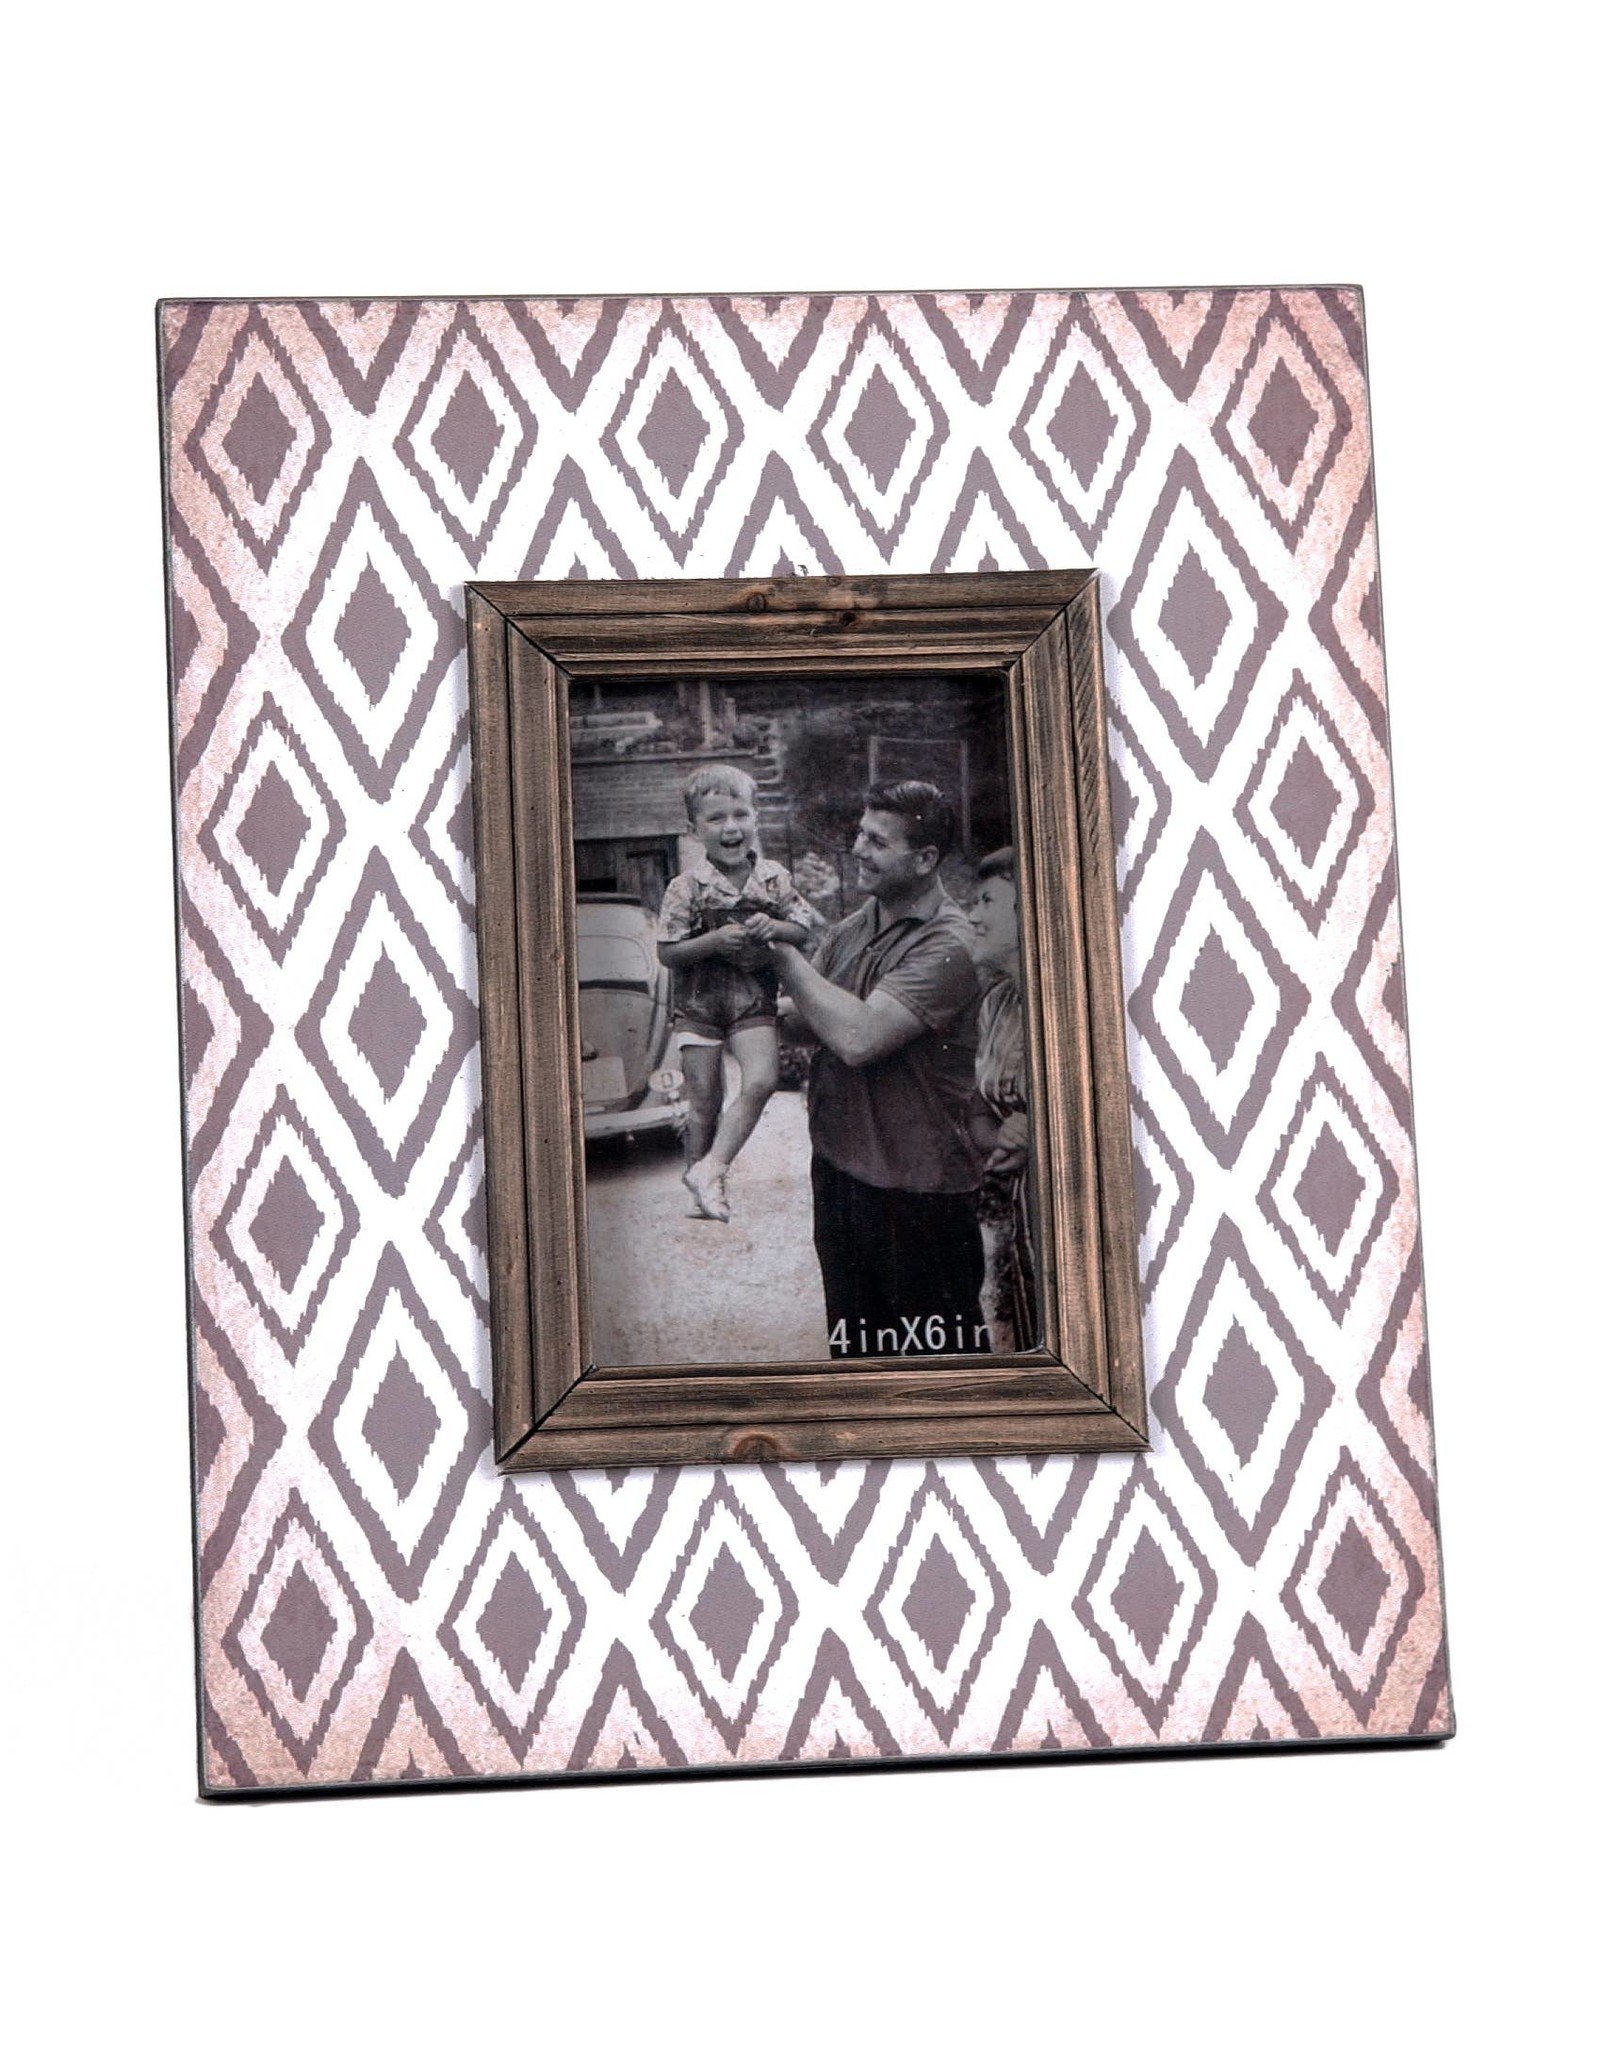 "Wilco Home Inc. 4"" x 6"" Wood Photo Frame - Tan"